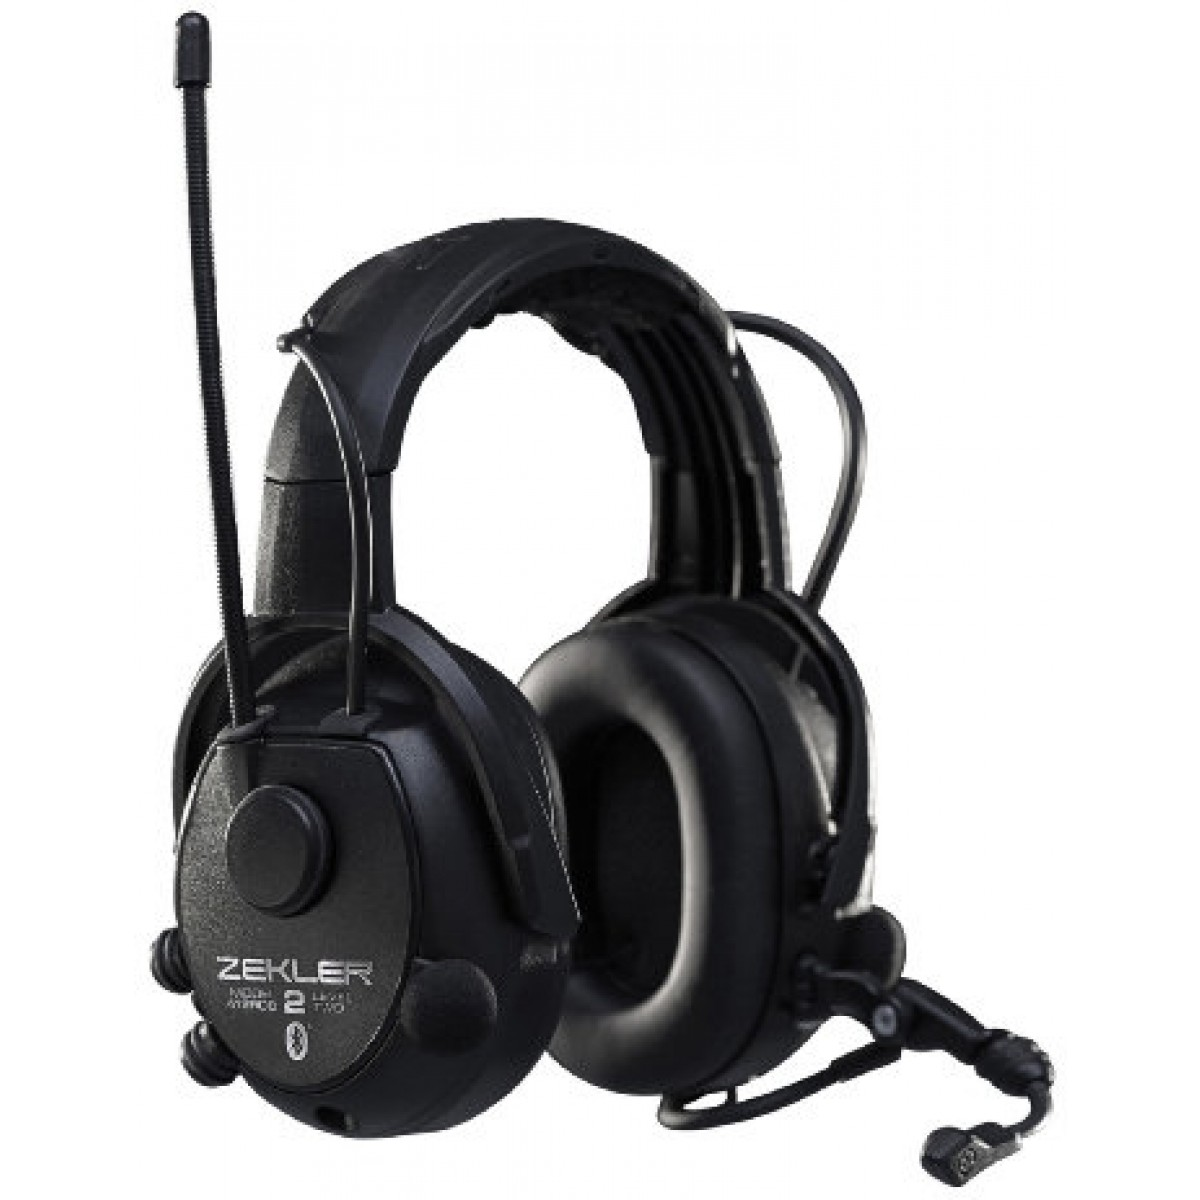 Høreværn ZEKLER 412RDB Bluetooth-31